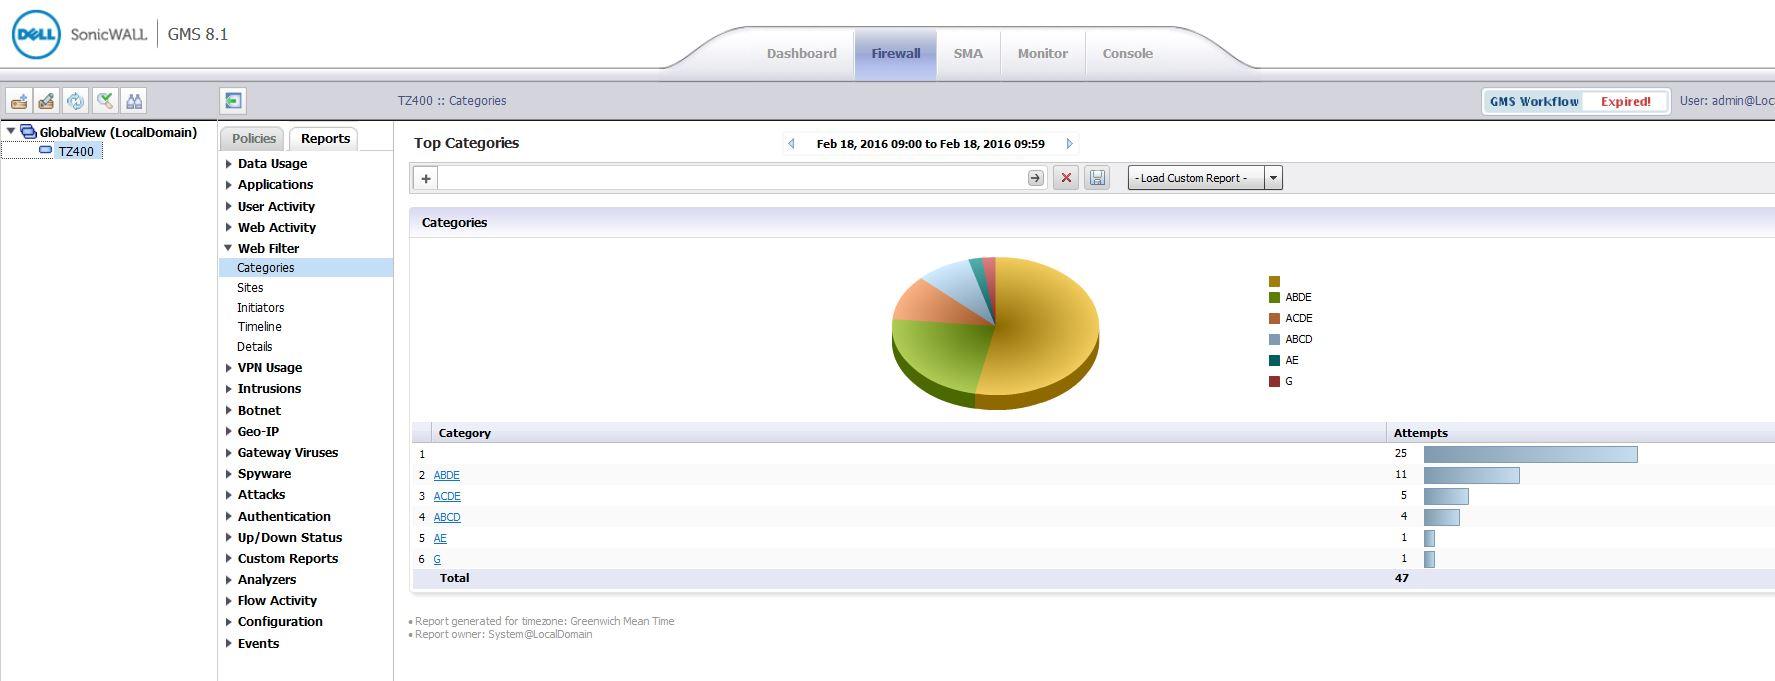 documents sonicwall application intelligence control visualization datasheet